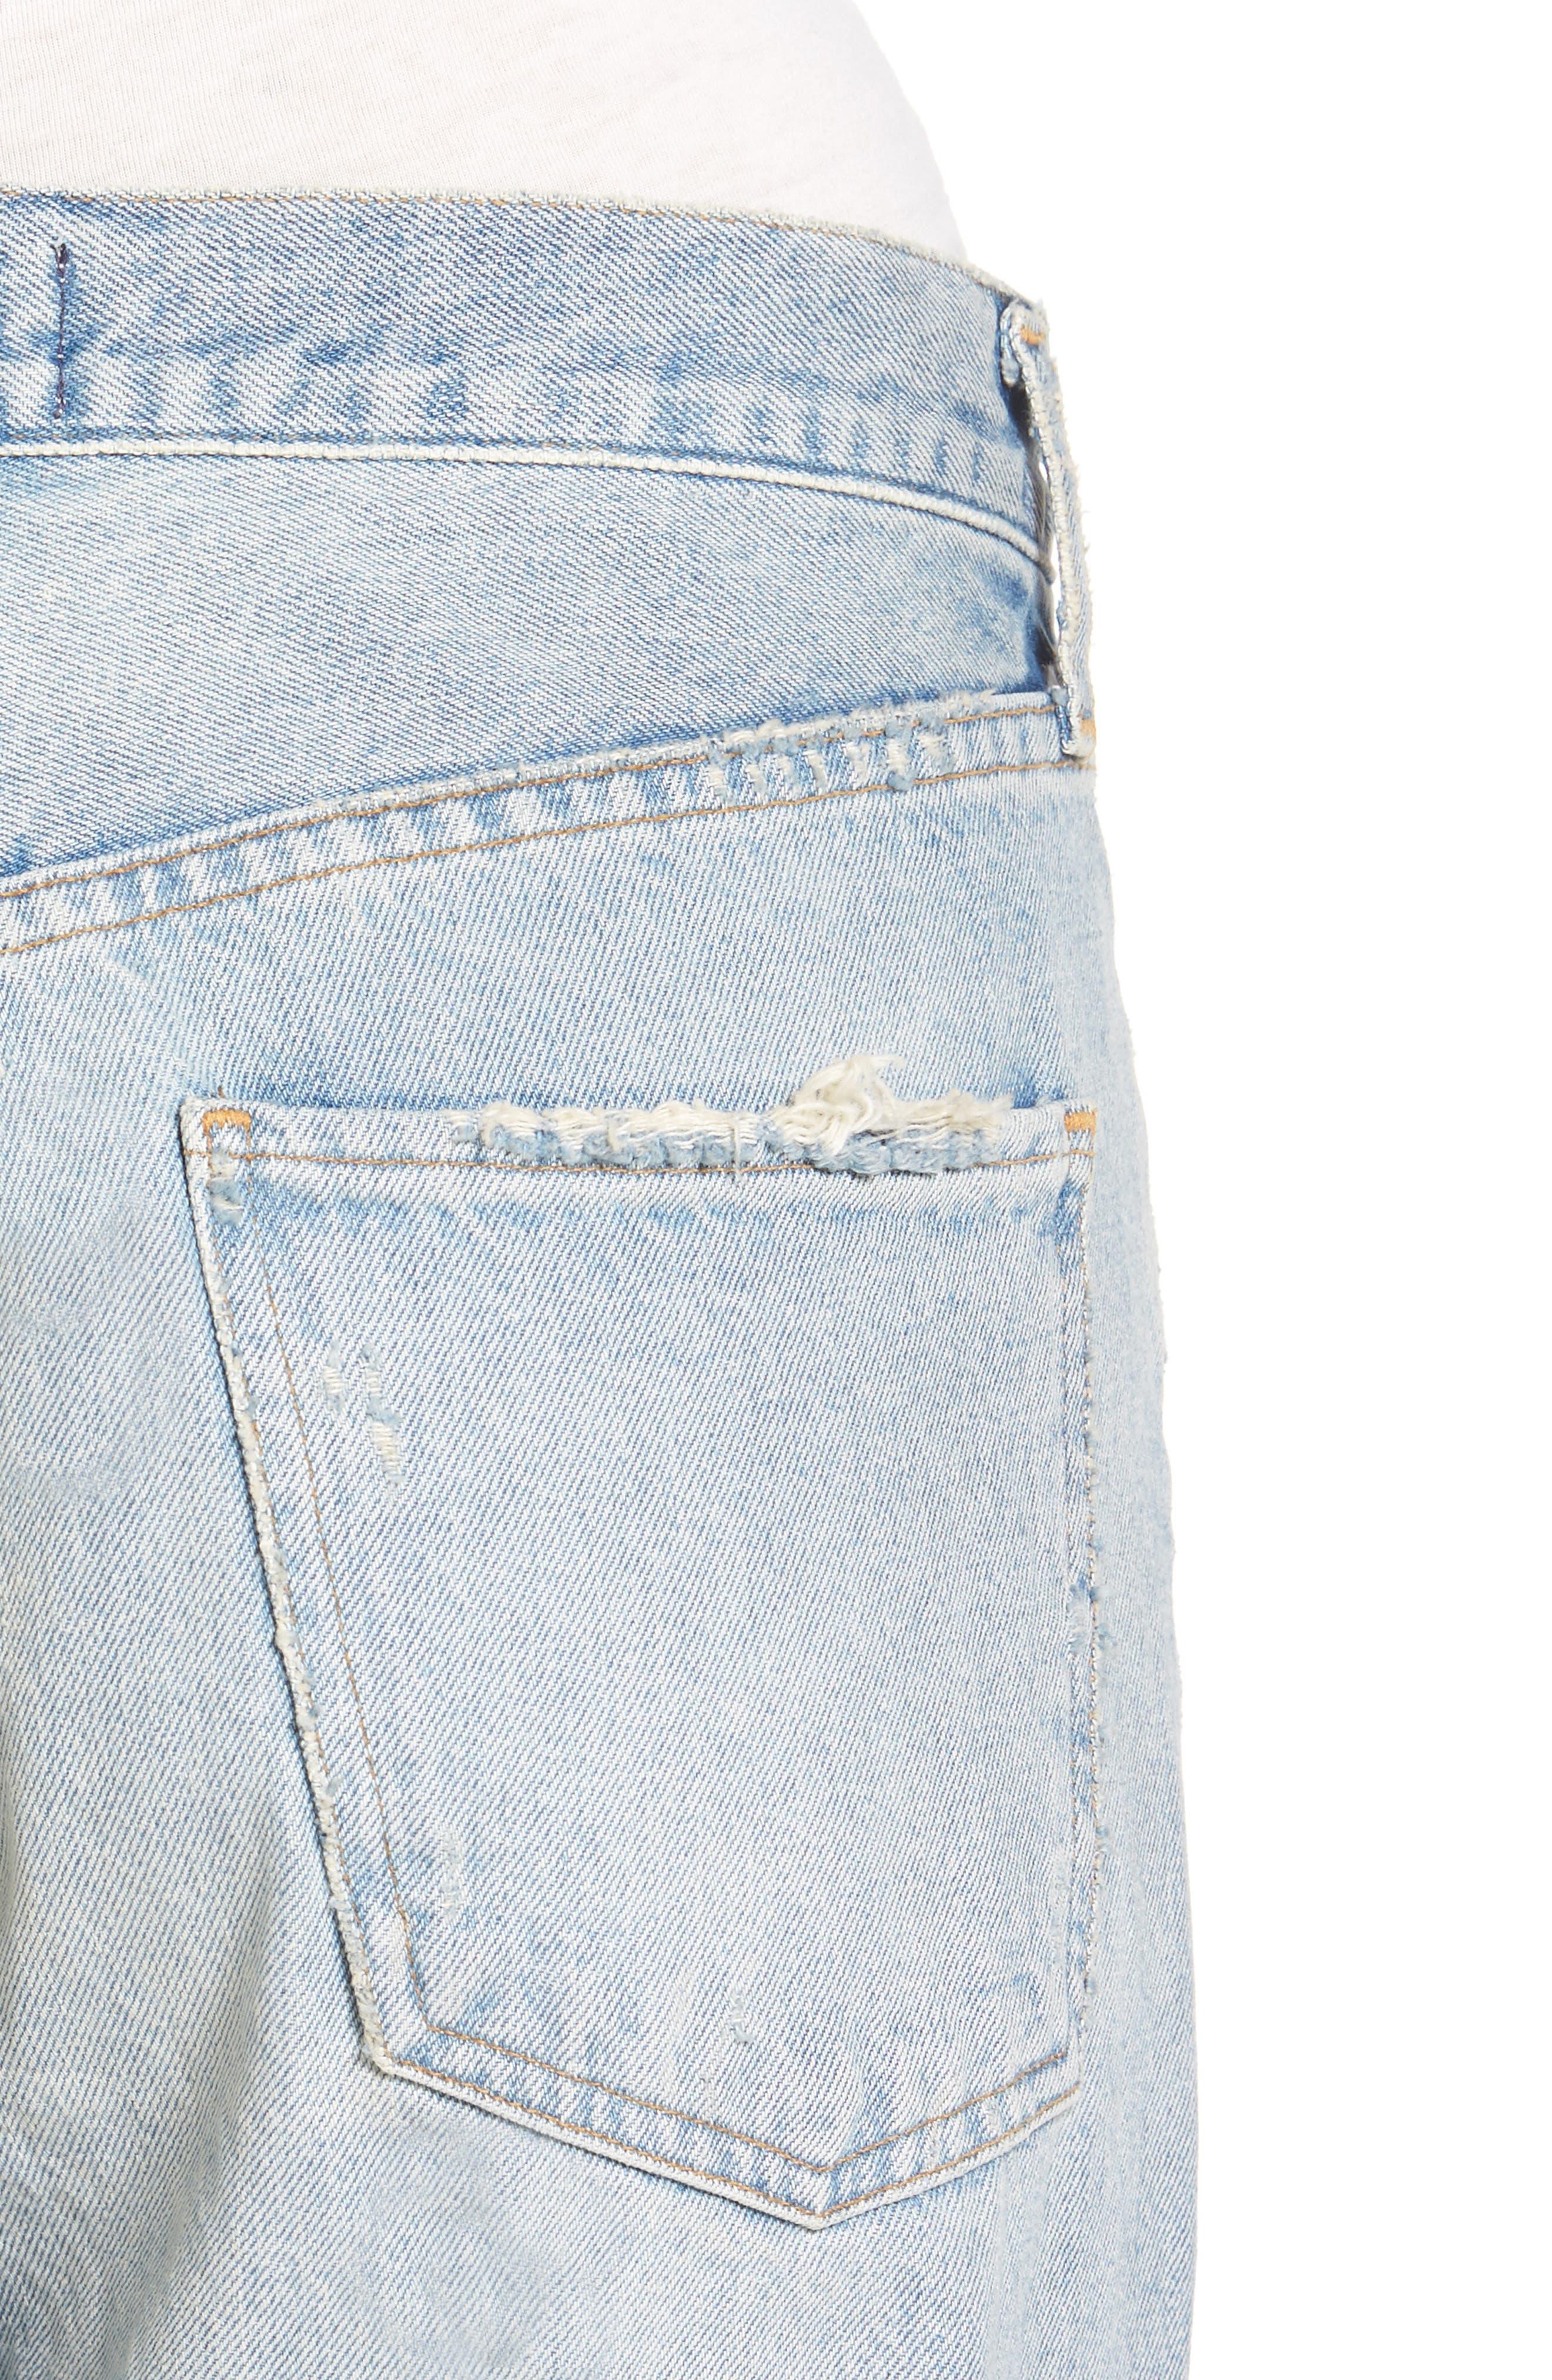 Ripped High Waist Straight Leg Jeans,                             Alternate thumbnail 4, color,                             457